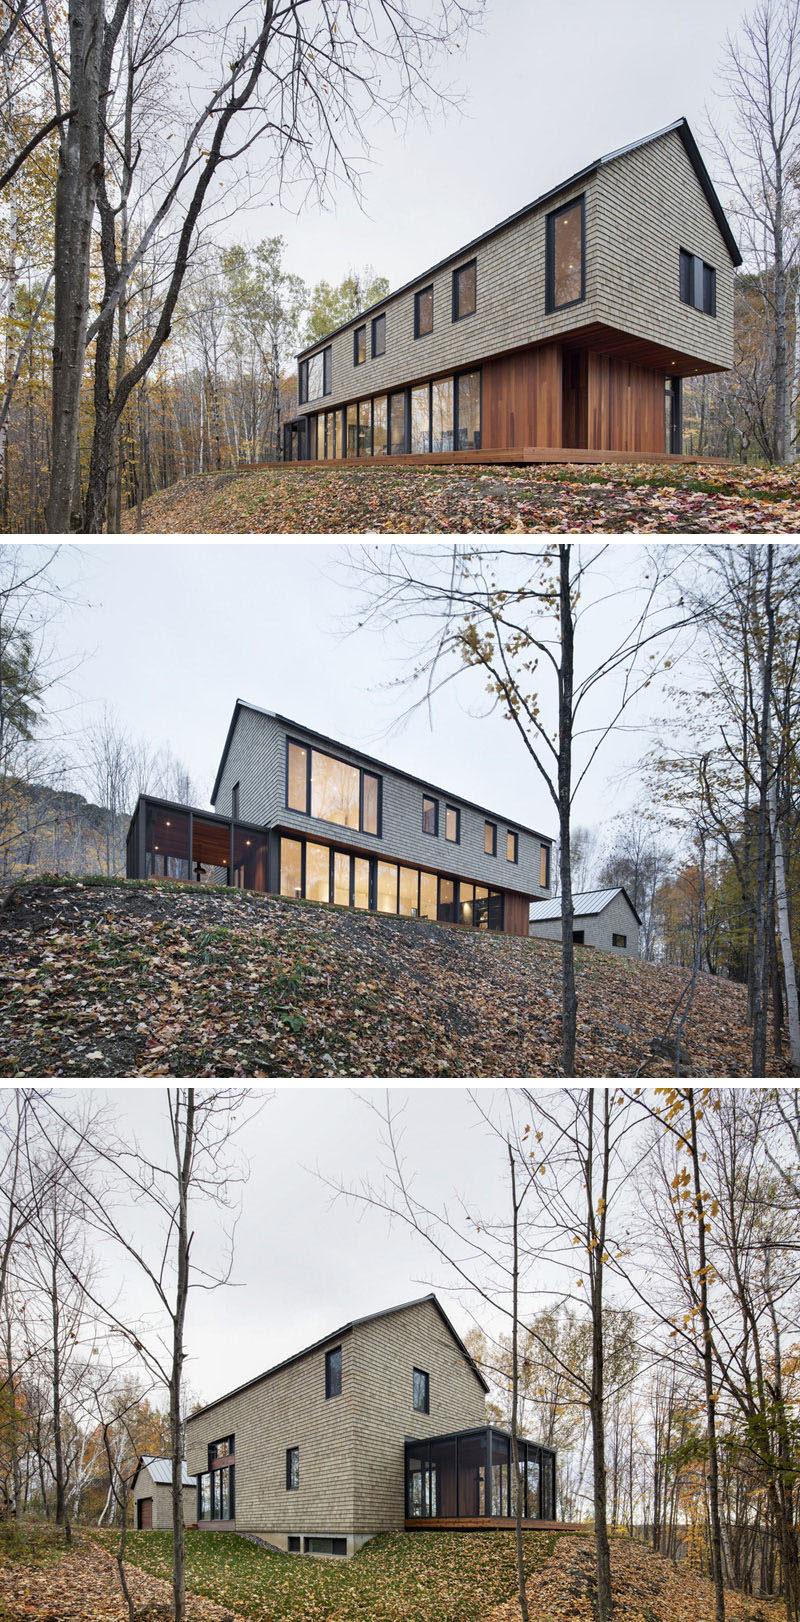 16 Bit Forest Home - cedar-shingled-house-201216-456-07-800x1622_Good 16 Bit Forest Home - cedar-shingled-house-201216-456-07-800x1622  HD_913133.jpg